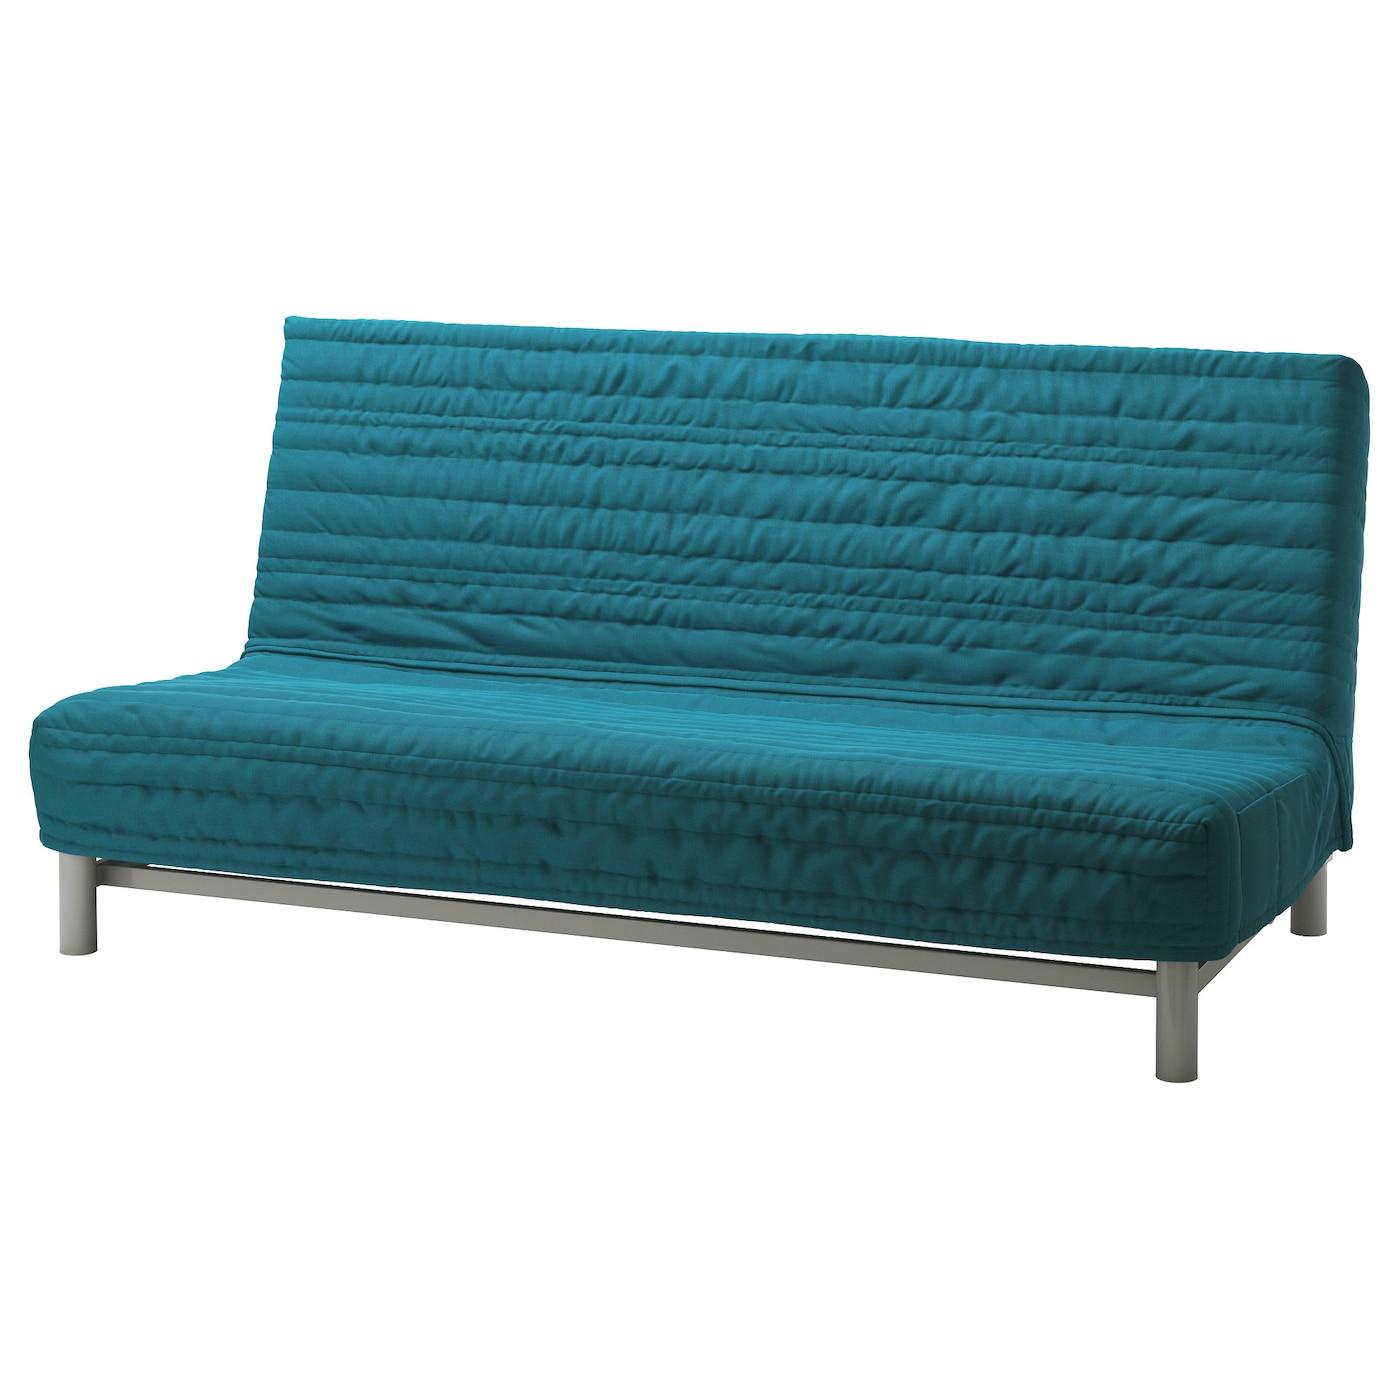 Schlafsofa ikea  BEDDINGE LÖVÅS Three-seat sofa-bed Knisa turquoise - IKEA